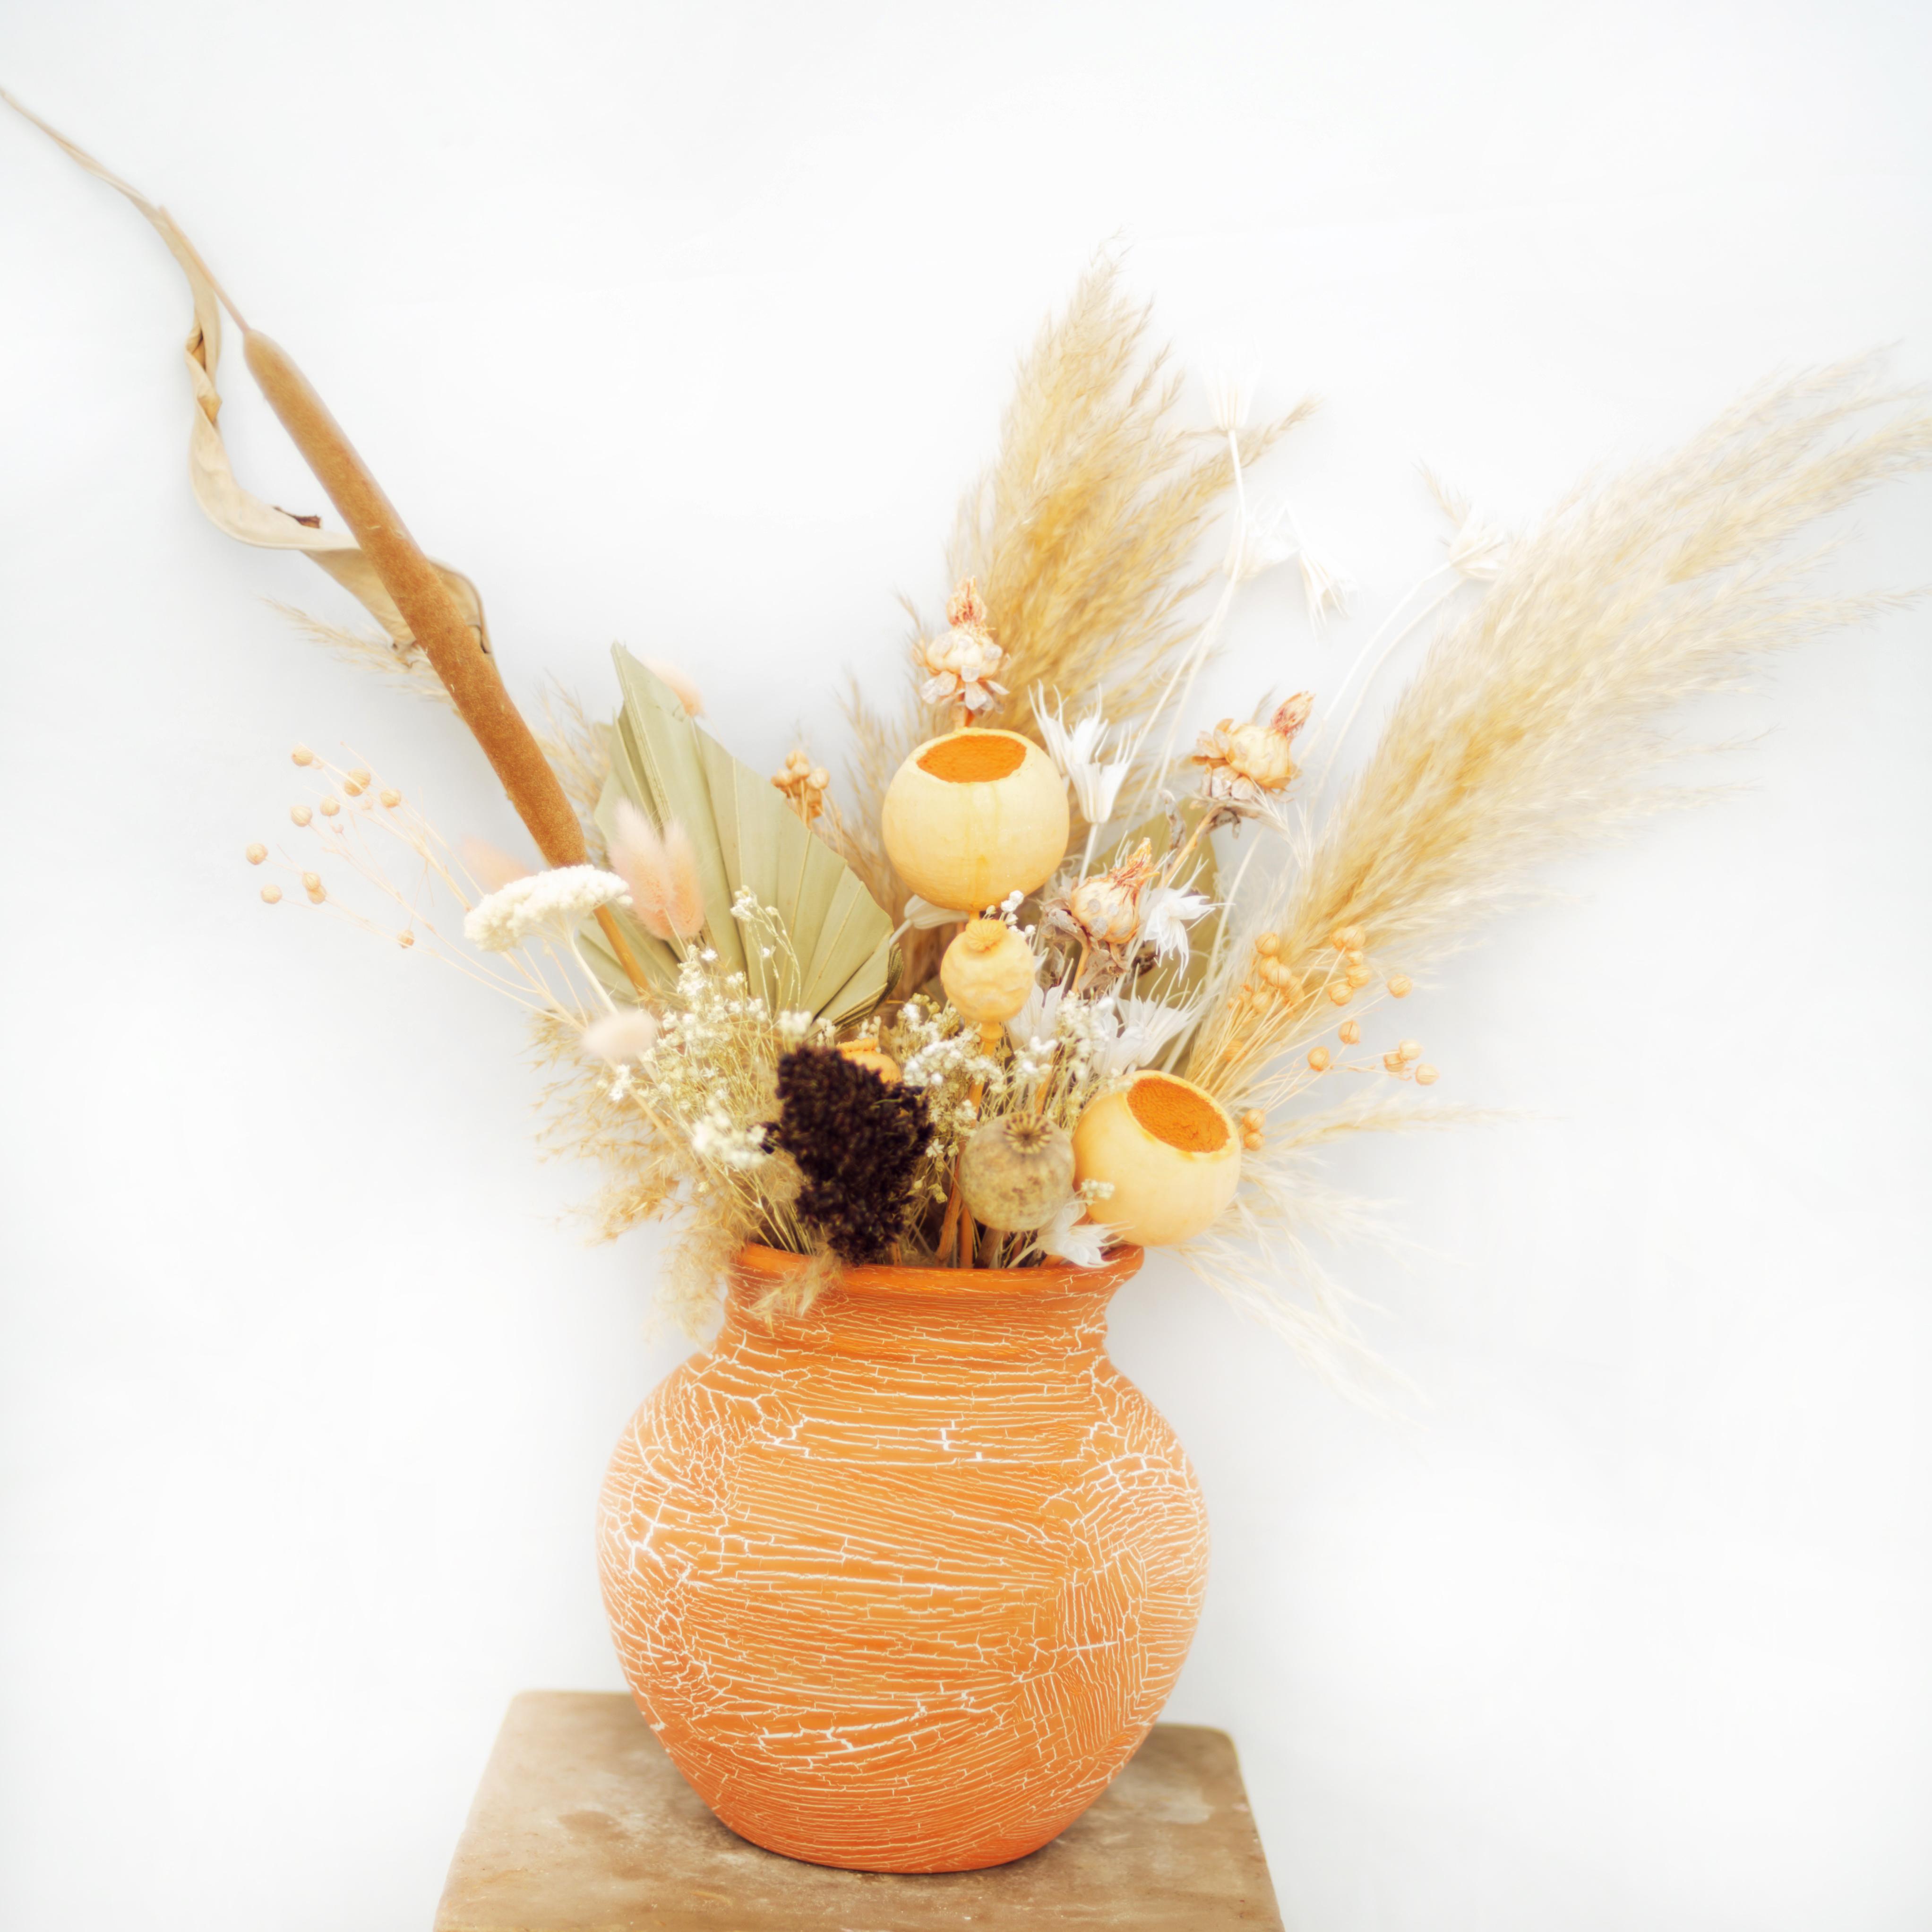 Dried flowers in handmade orange pot